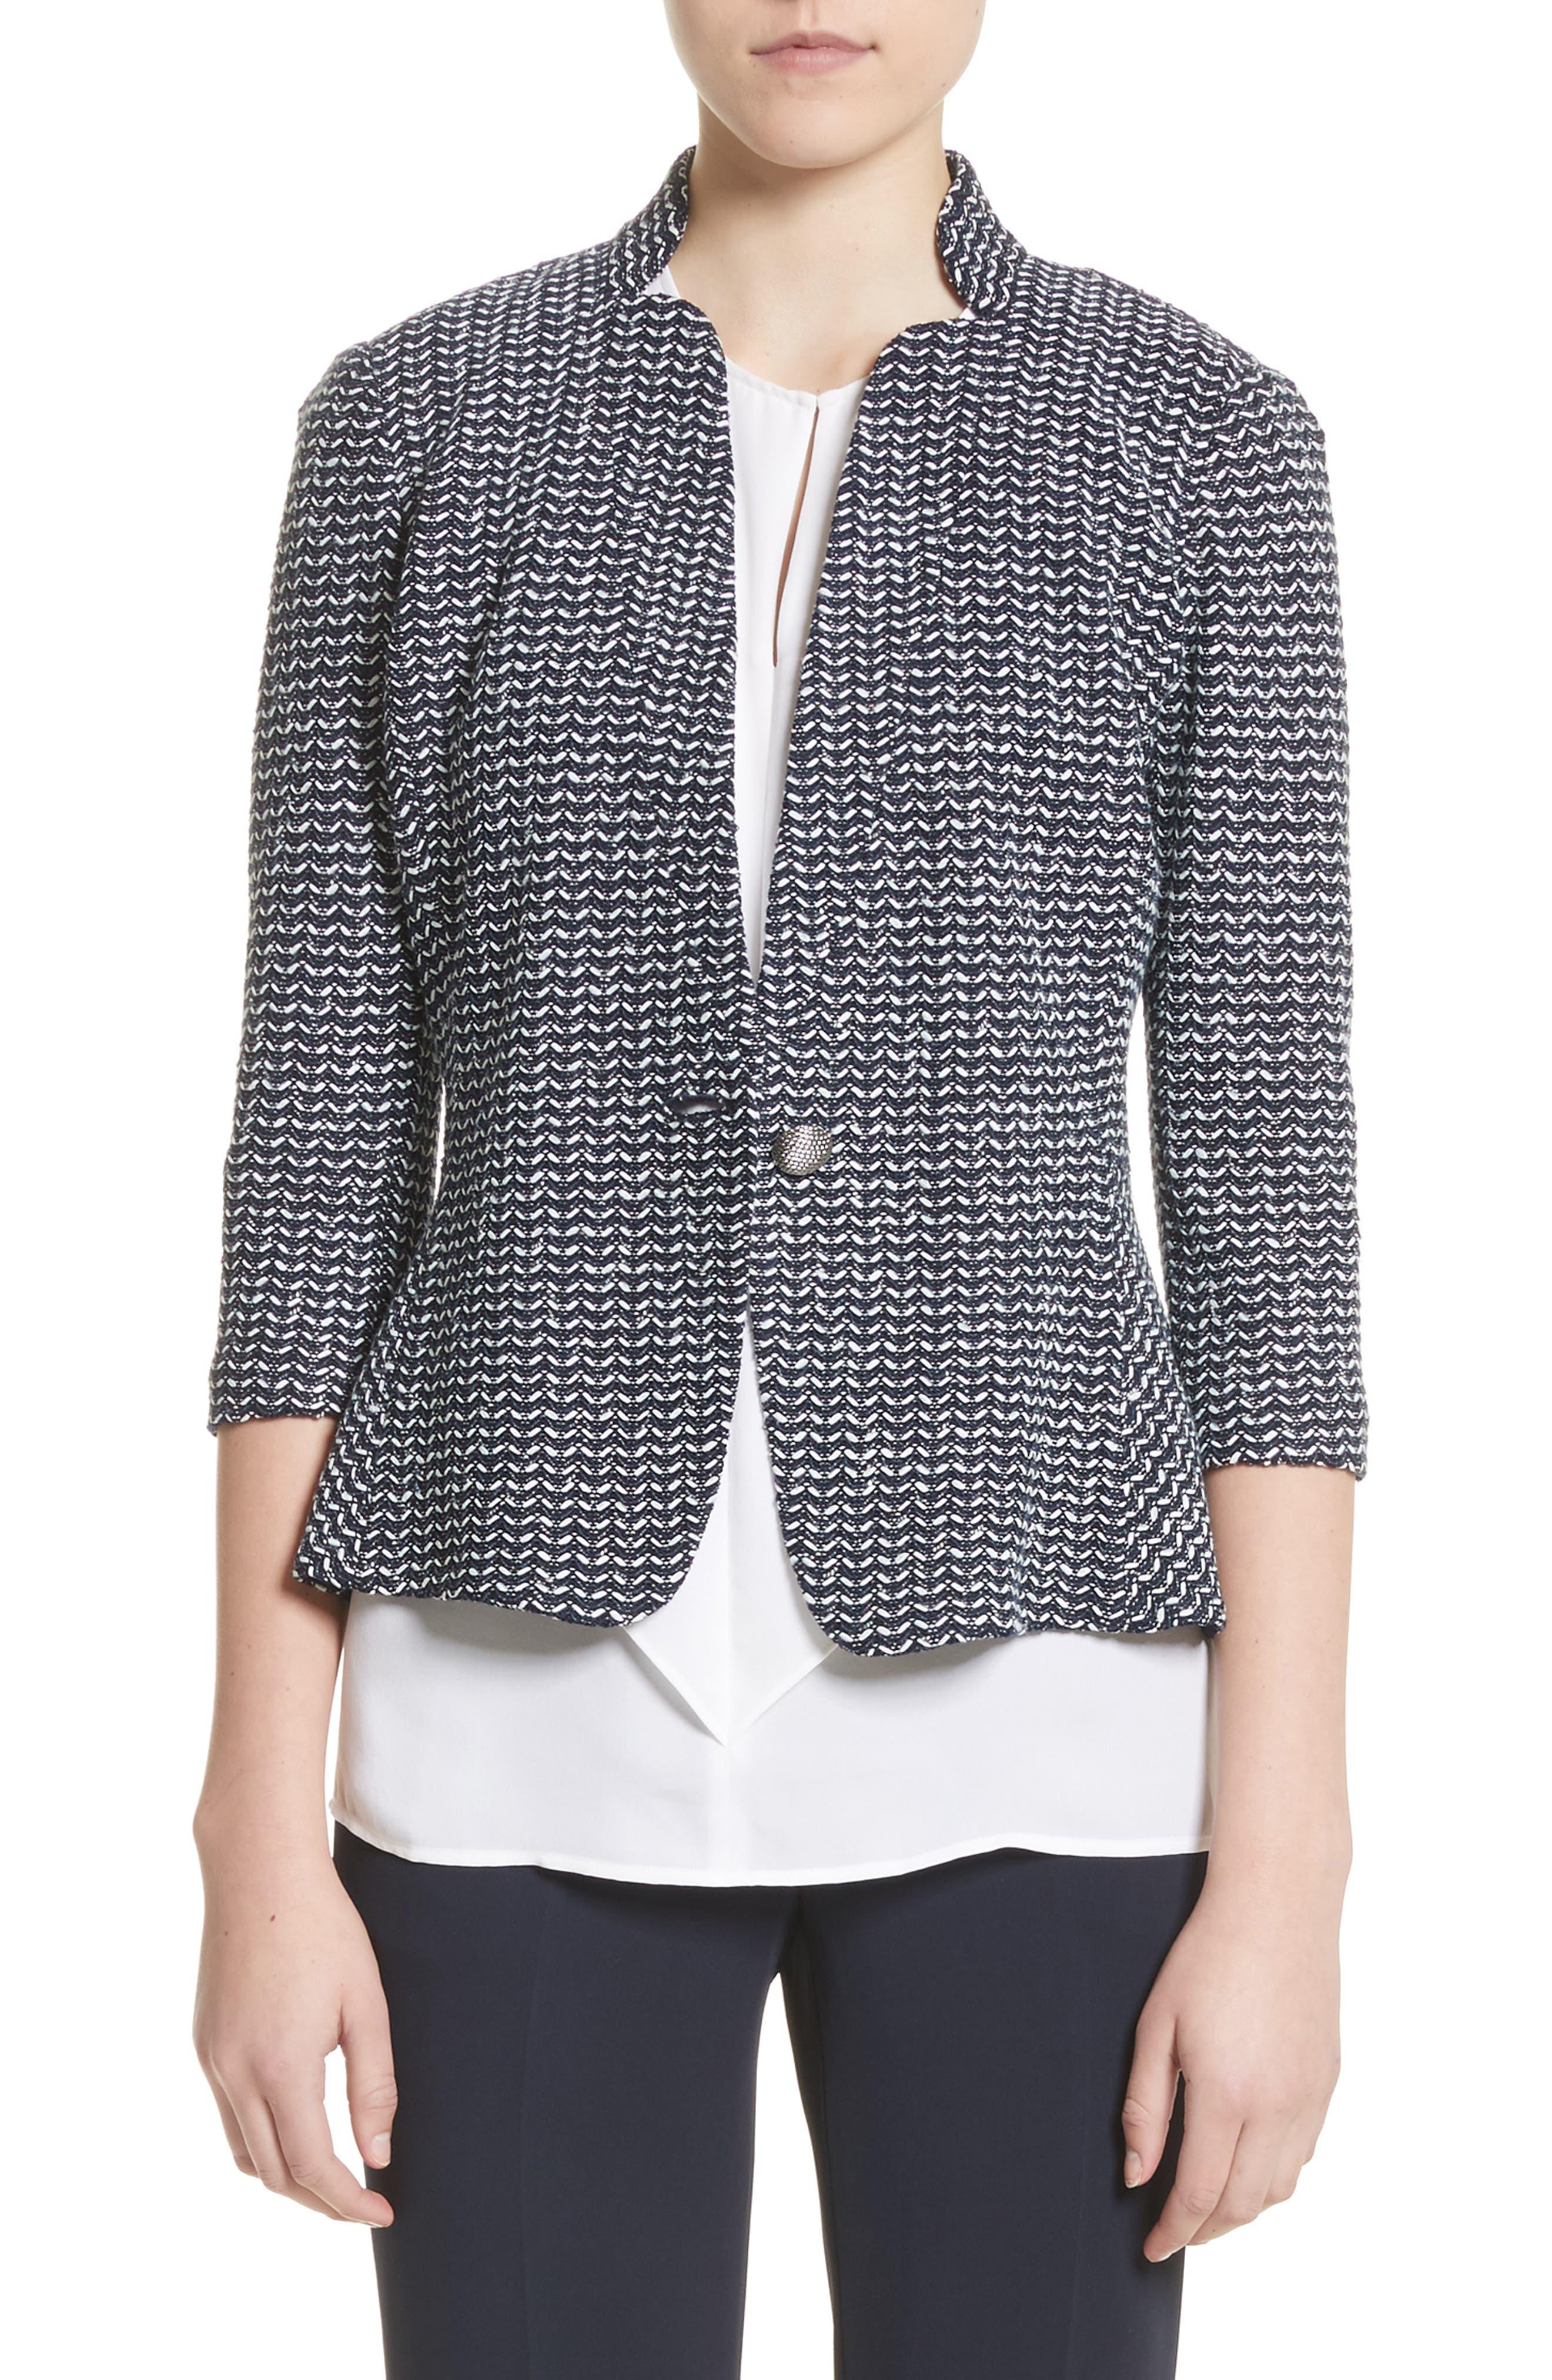 Chevron Knit Jacket,                         Main,                         color, Navy Multi